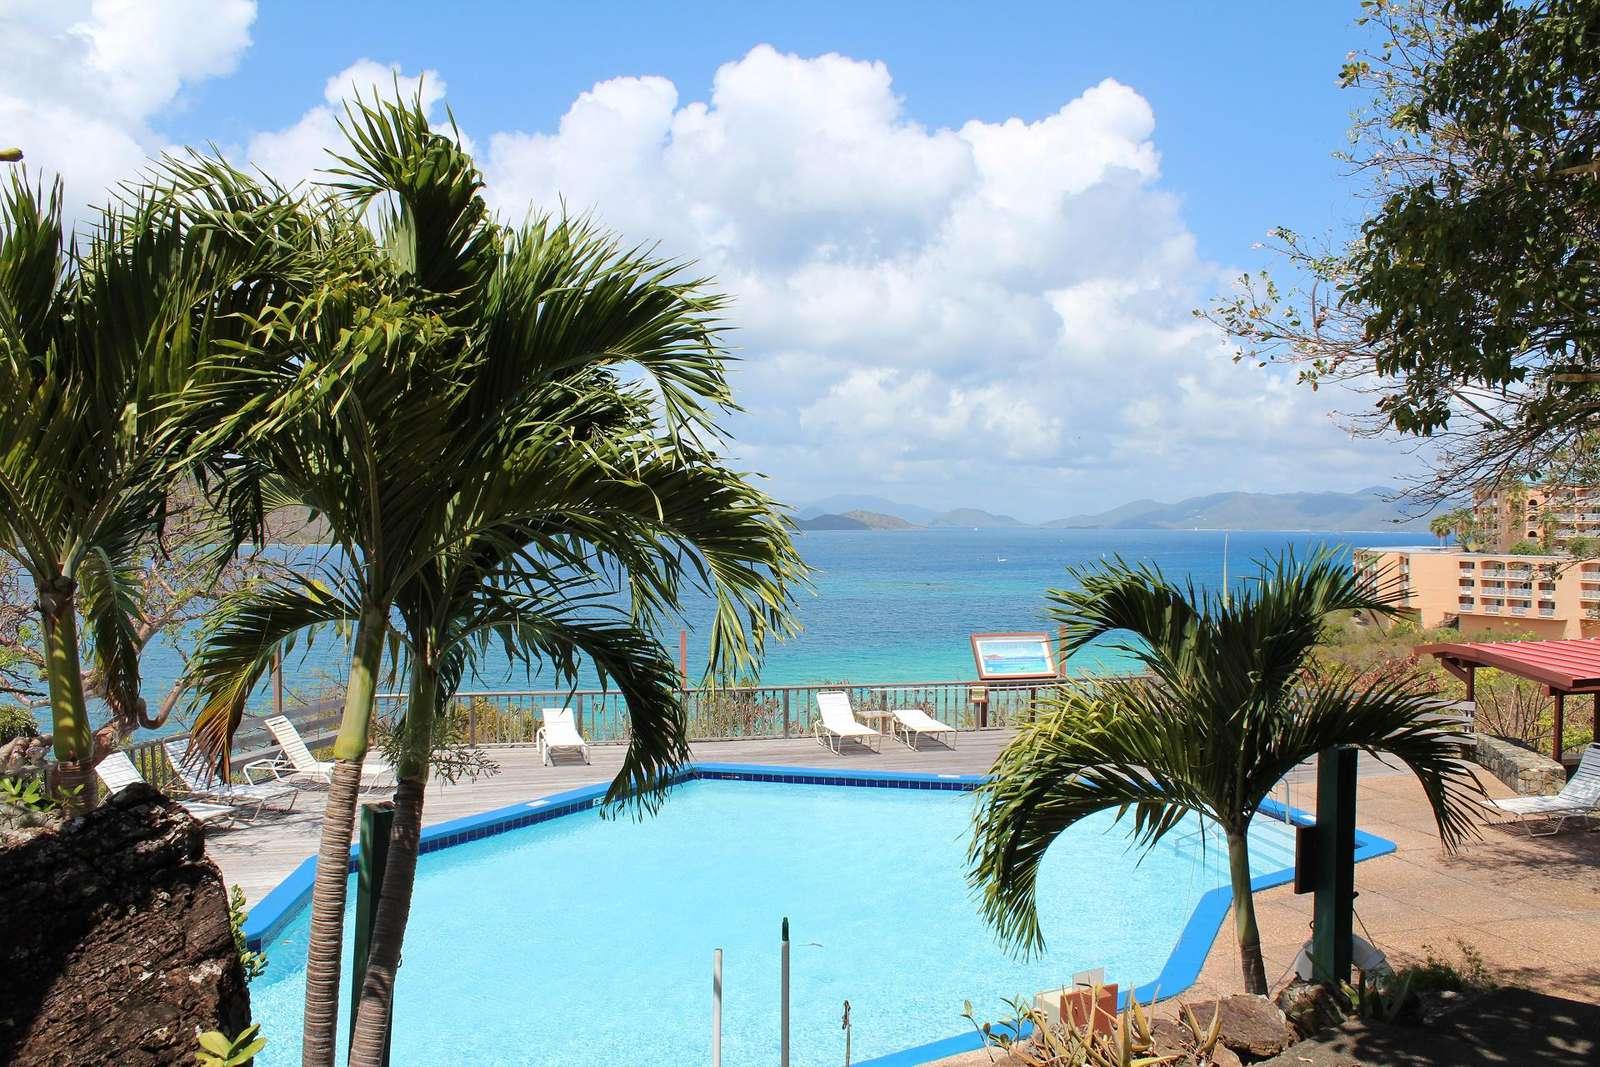 Terrace Pool - short walk from Condo